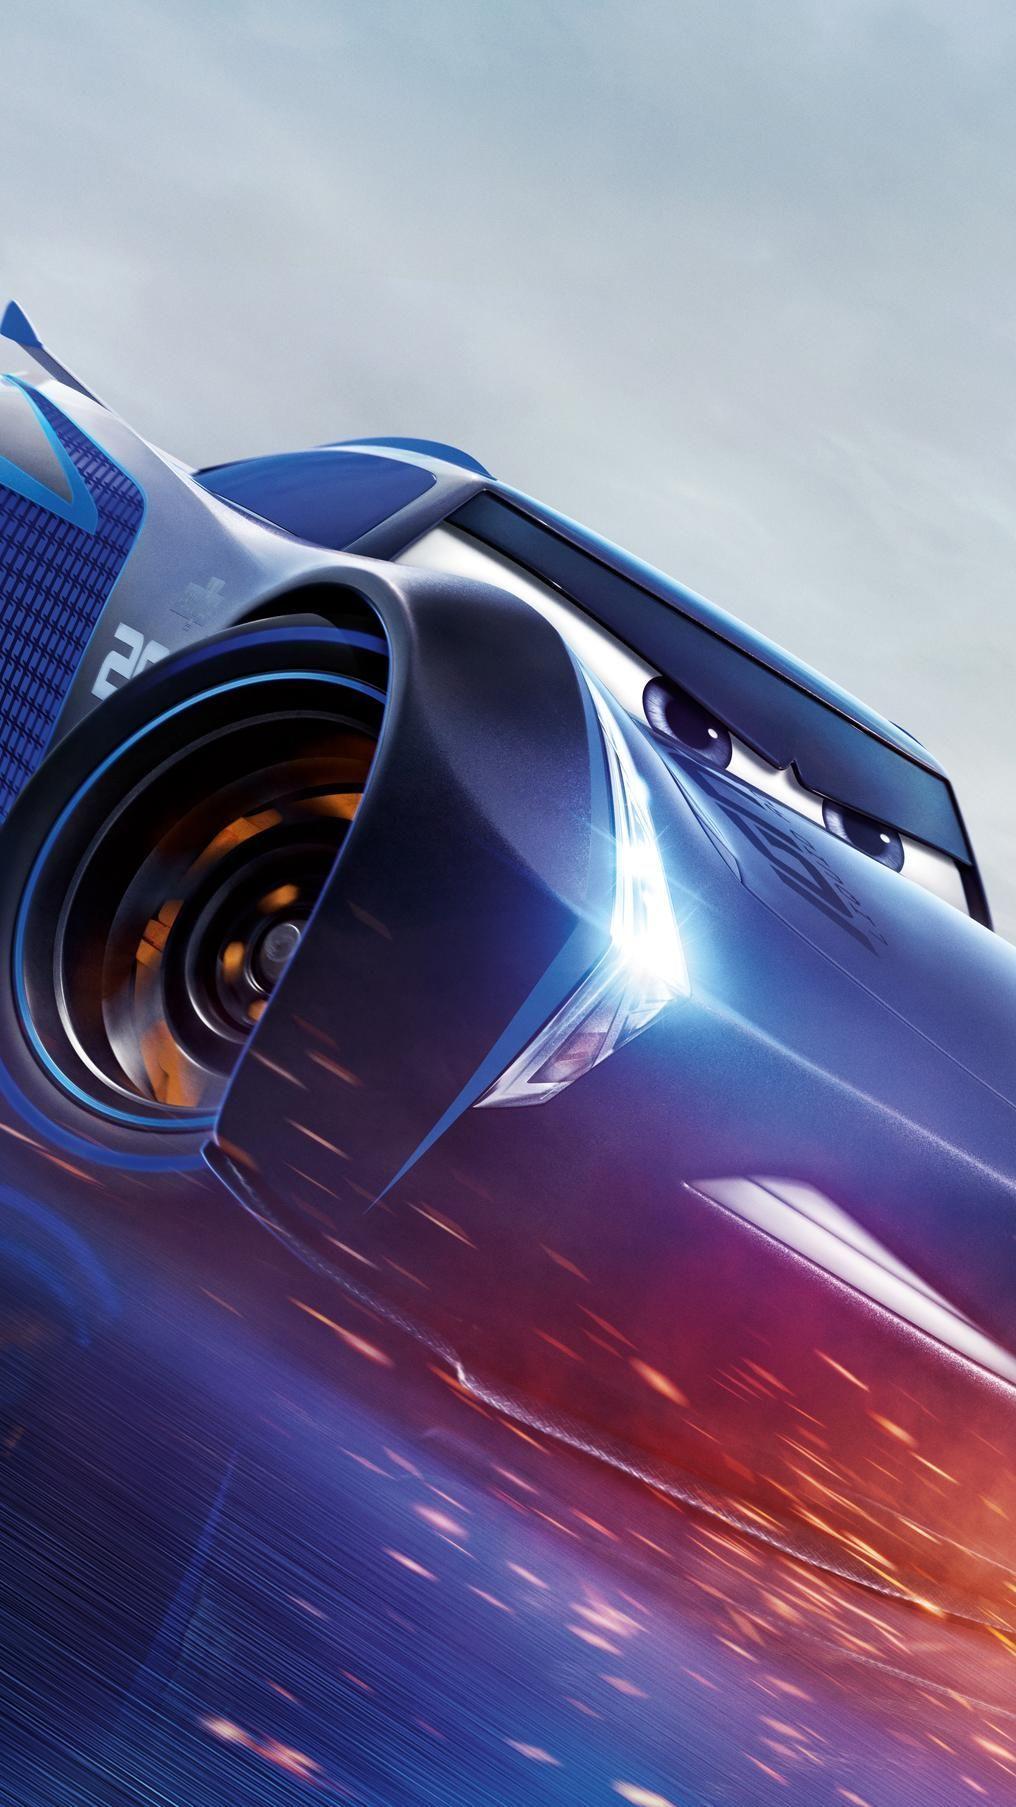 Cars 3 (2017) Phone Wallpaper Moviemania, cars